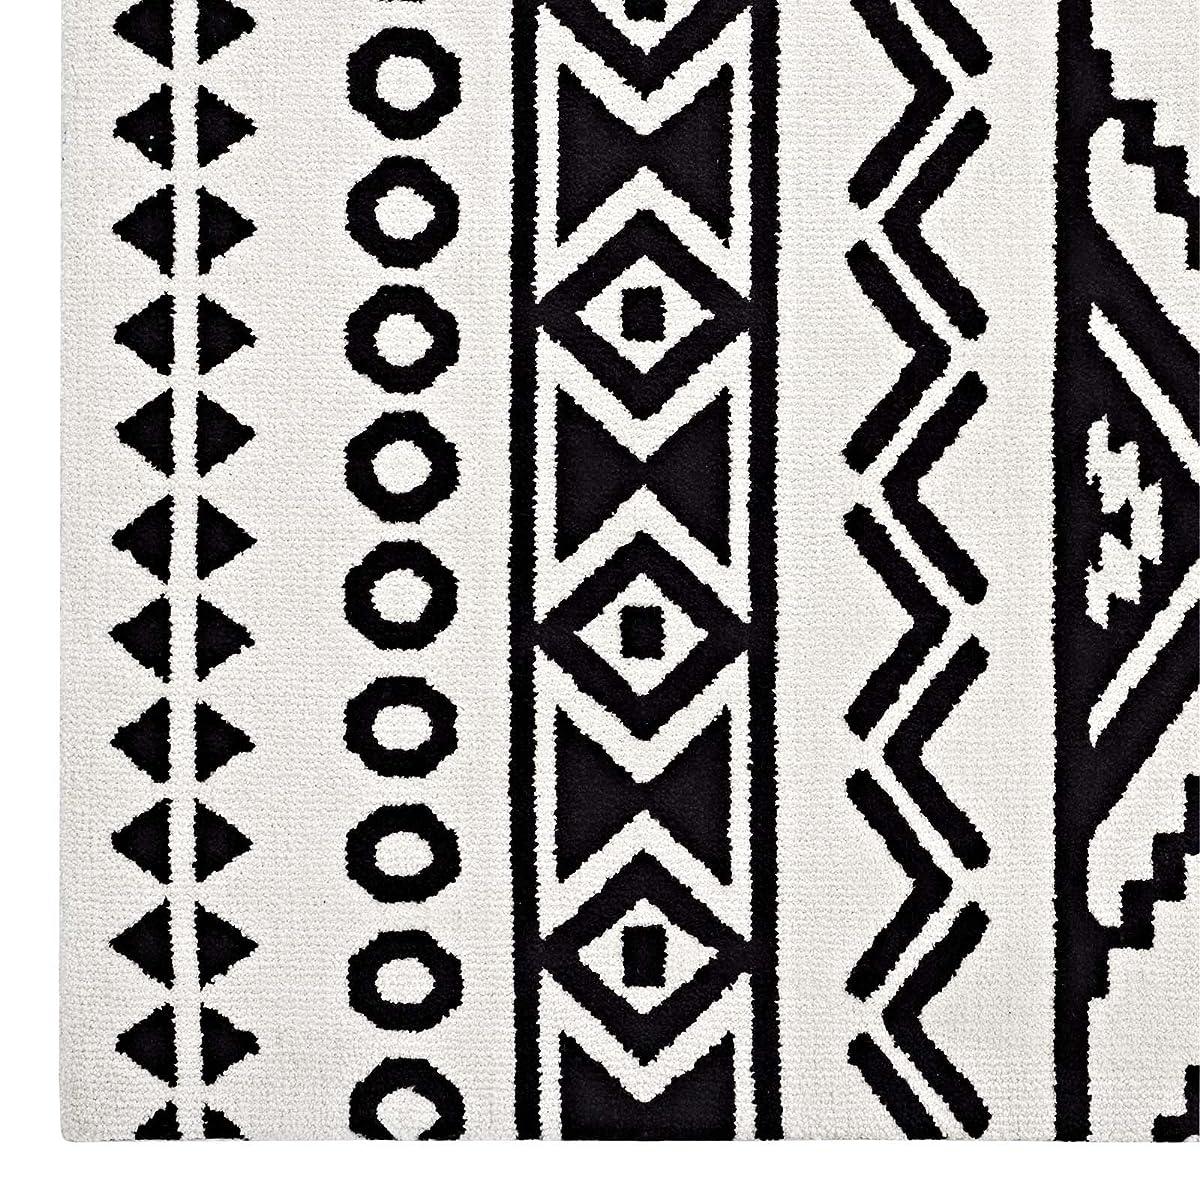 Modway R-1010A-58 Haku Geometric Moroccan Tribal Area Rug, 5X8, Black and White